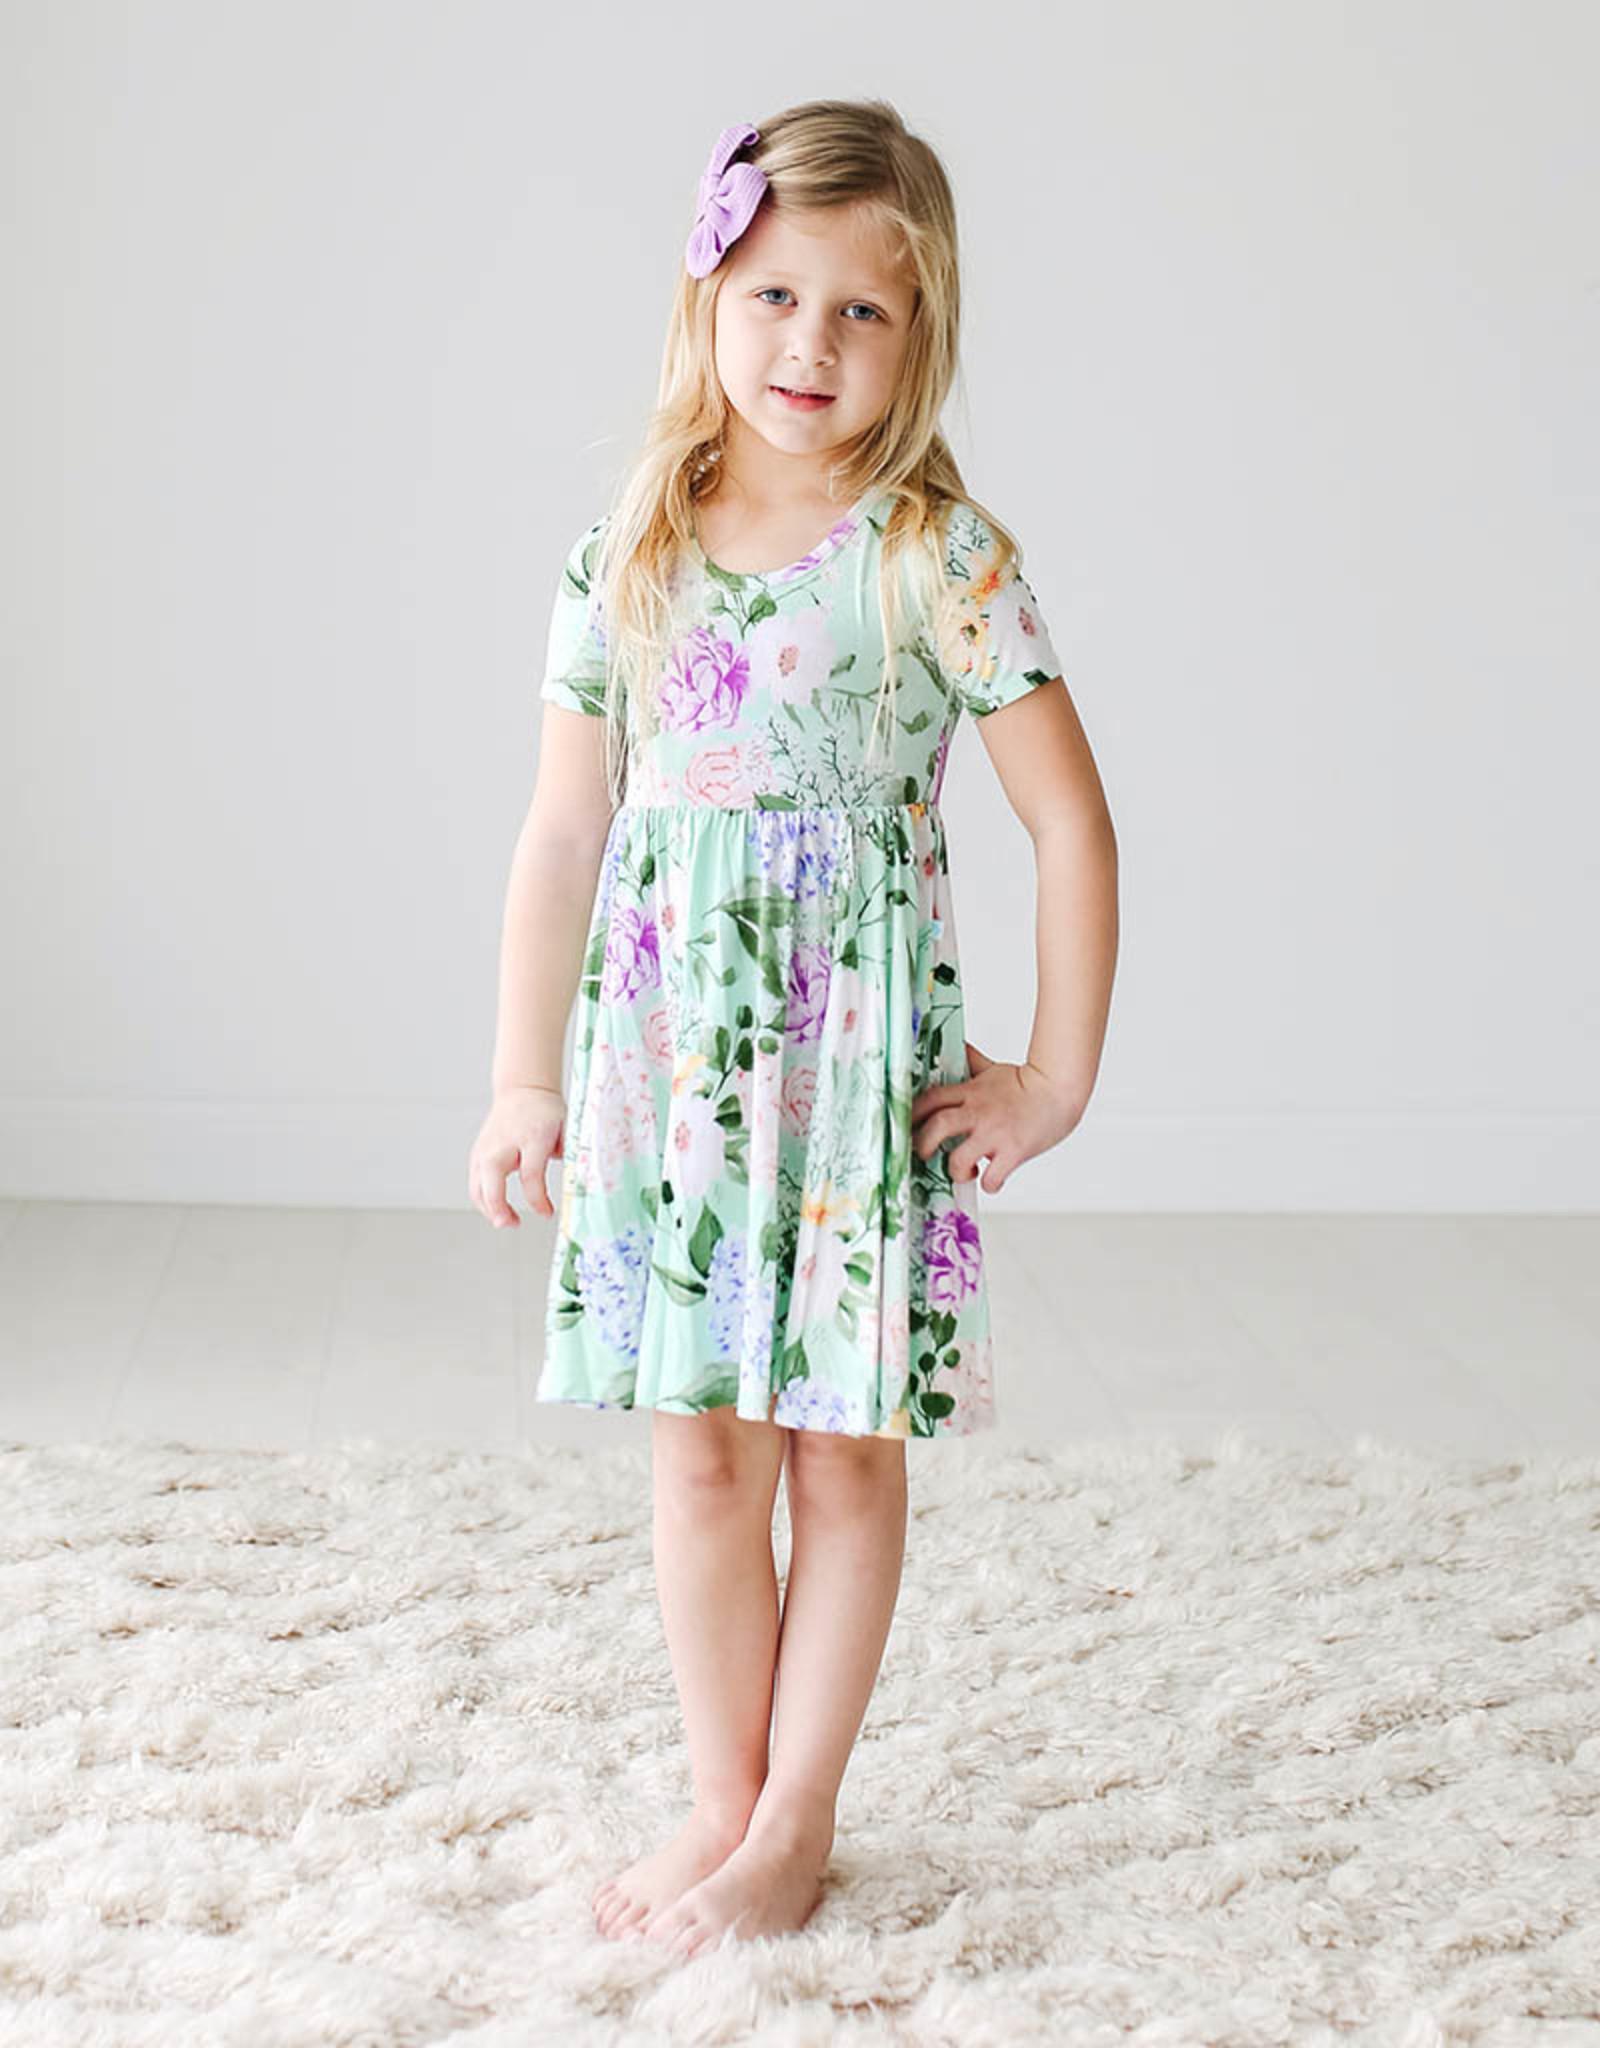 POSH PEANUT ERIN- SHORT SLVE BASIC TWIRL DRESS